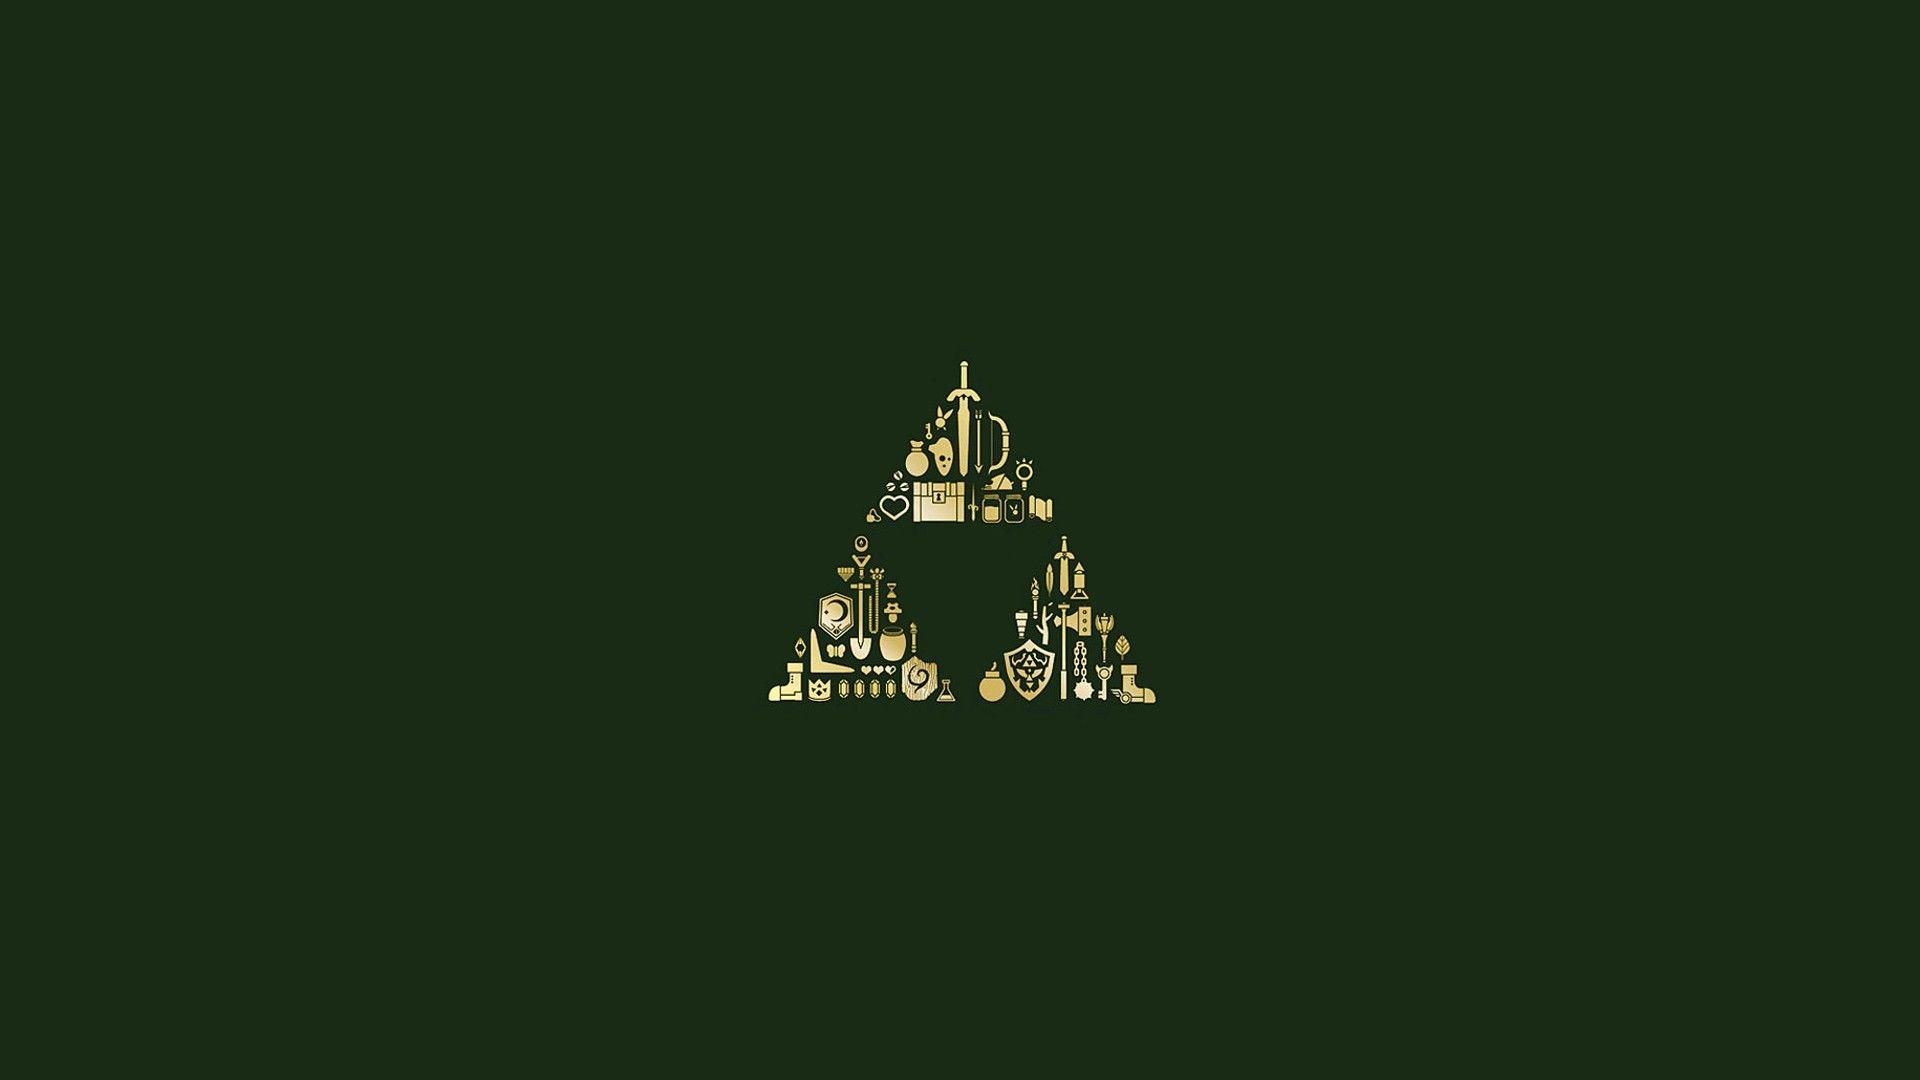 Hylian Shield Video Games Minimalism Simple Background The Legend Of Zelda Triforce Green Backgrou Legend Of Zelda Legend Of Zelda Poster Zelda Hd